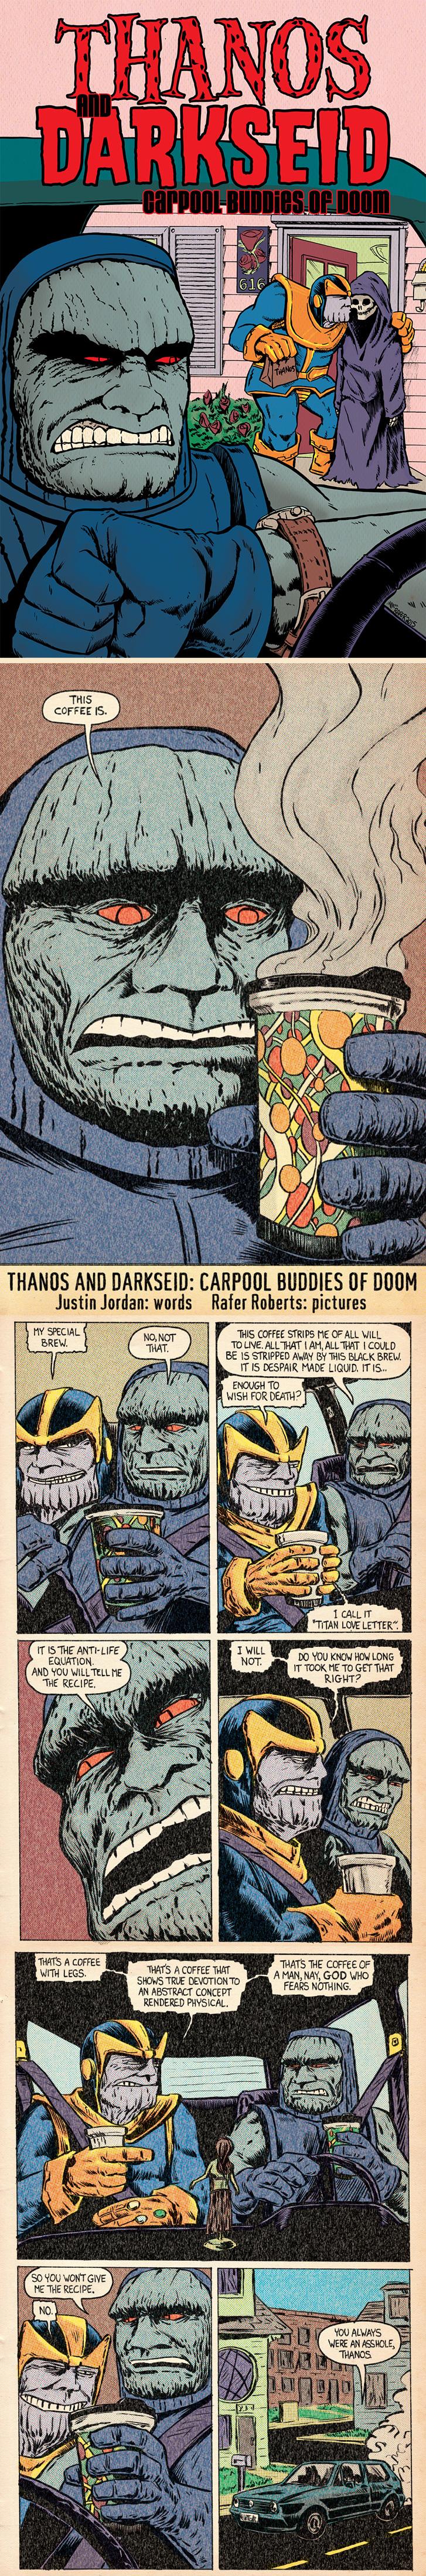 Thanos and Darkseid: Carpool Buddies of Doom